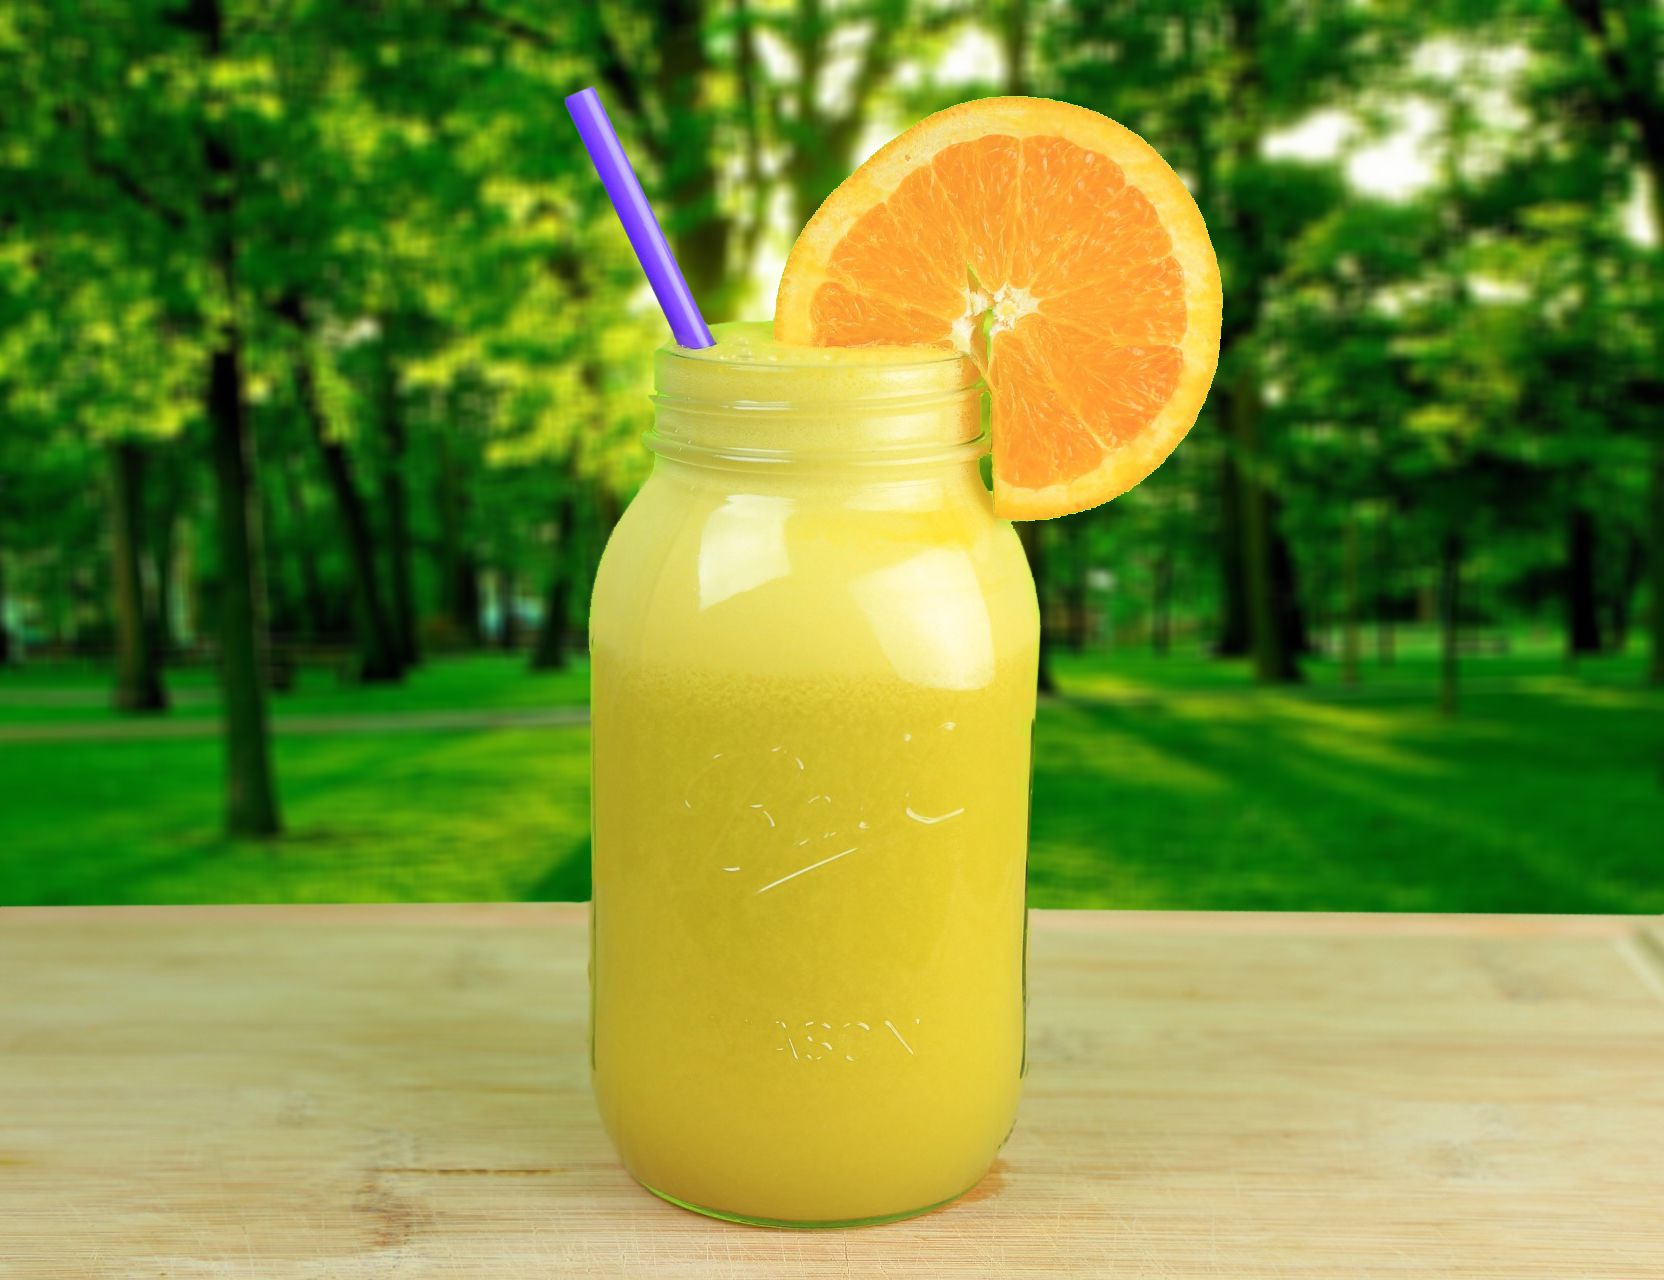 Colon cleansing juice get those bowels moving juice